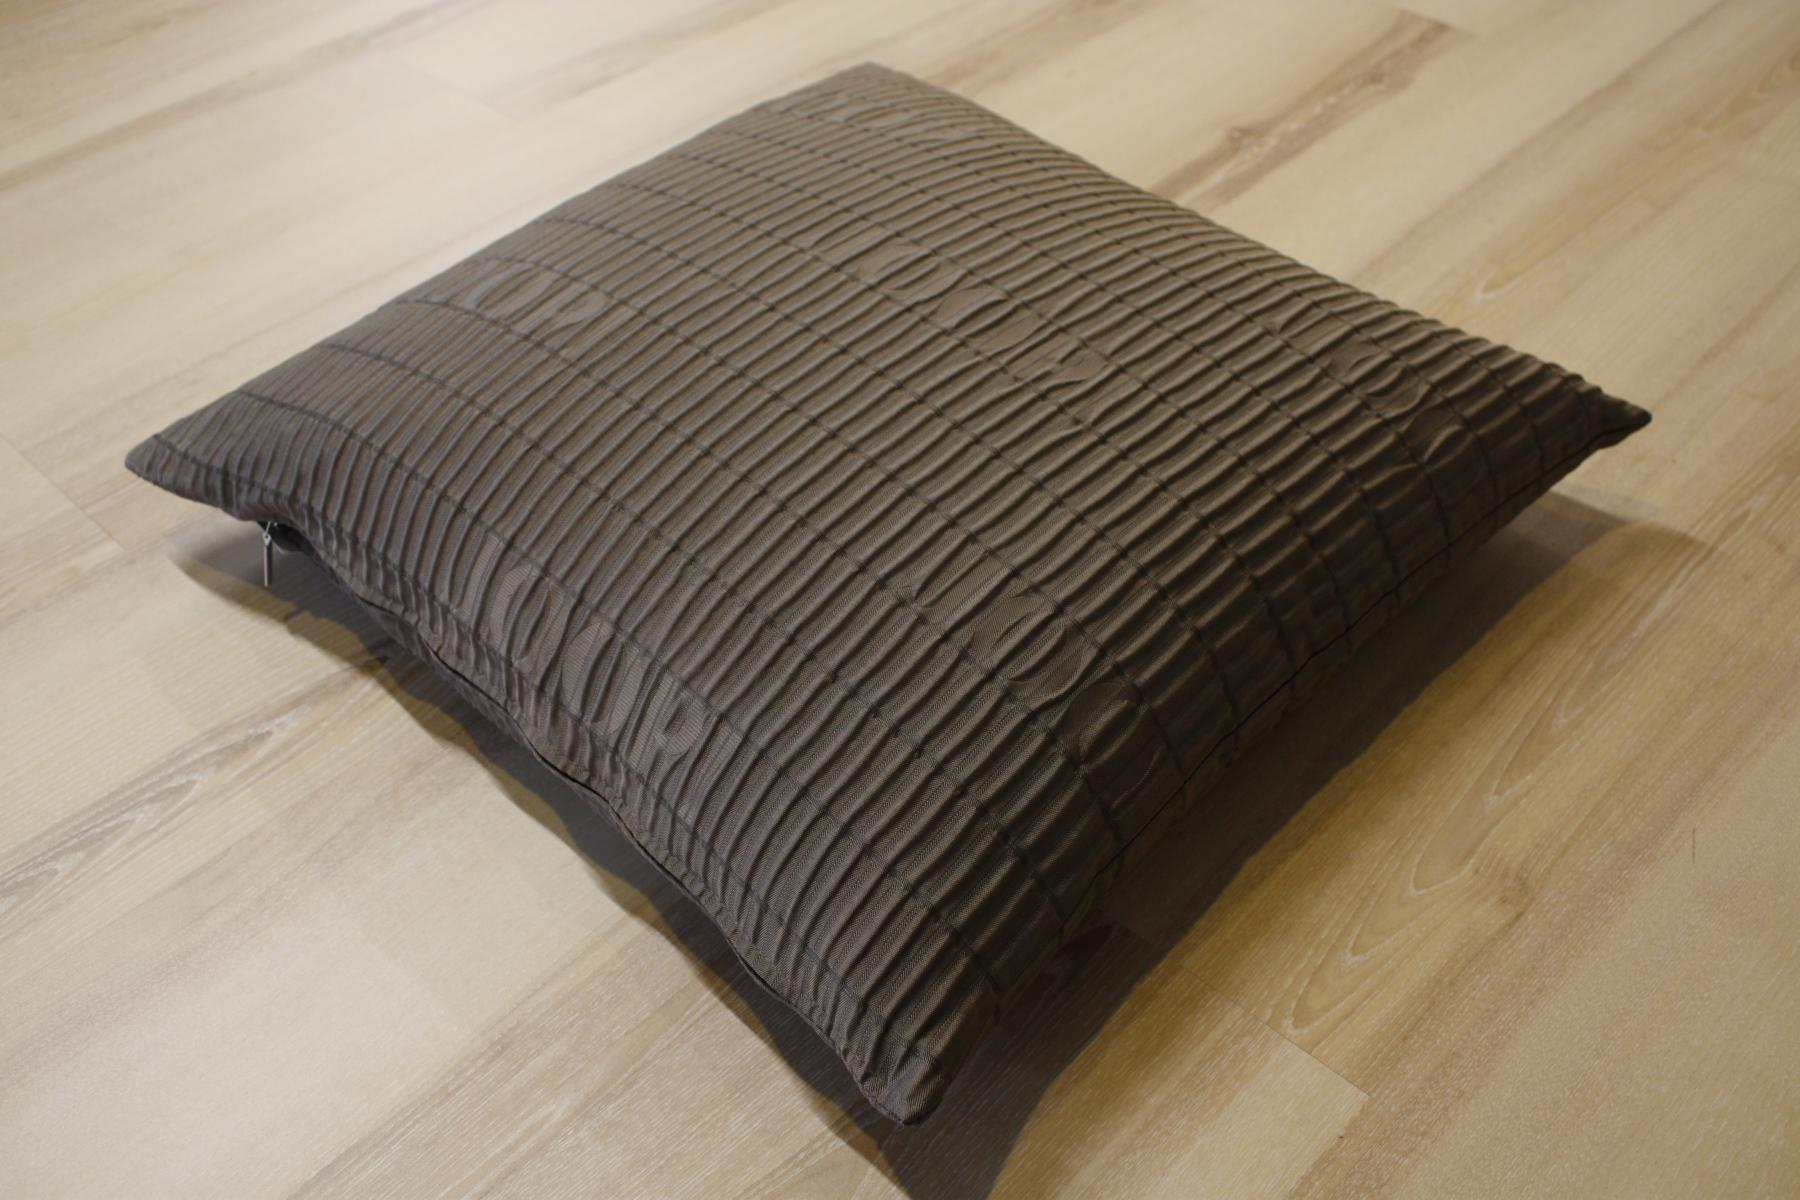 joop kissen wrinkle 022 kitt 50x50 cm inkl federf llung ebay. Black Bedroom Furniture Sets. Home Design Ideas